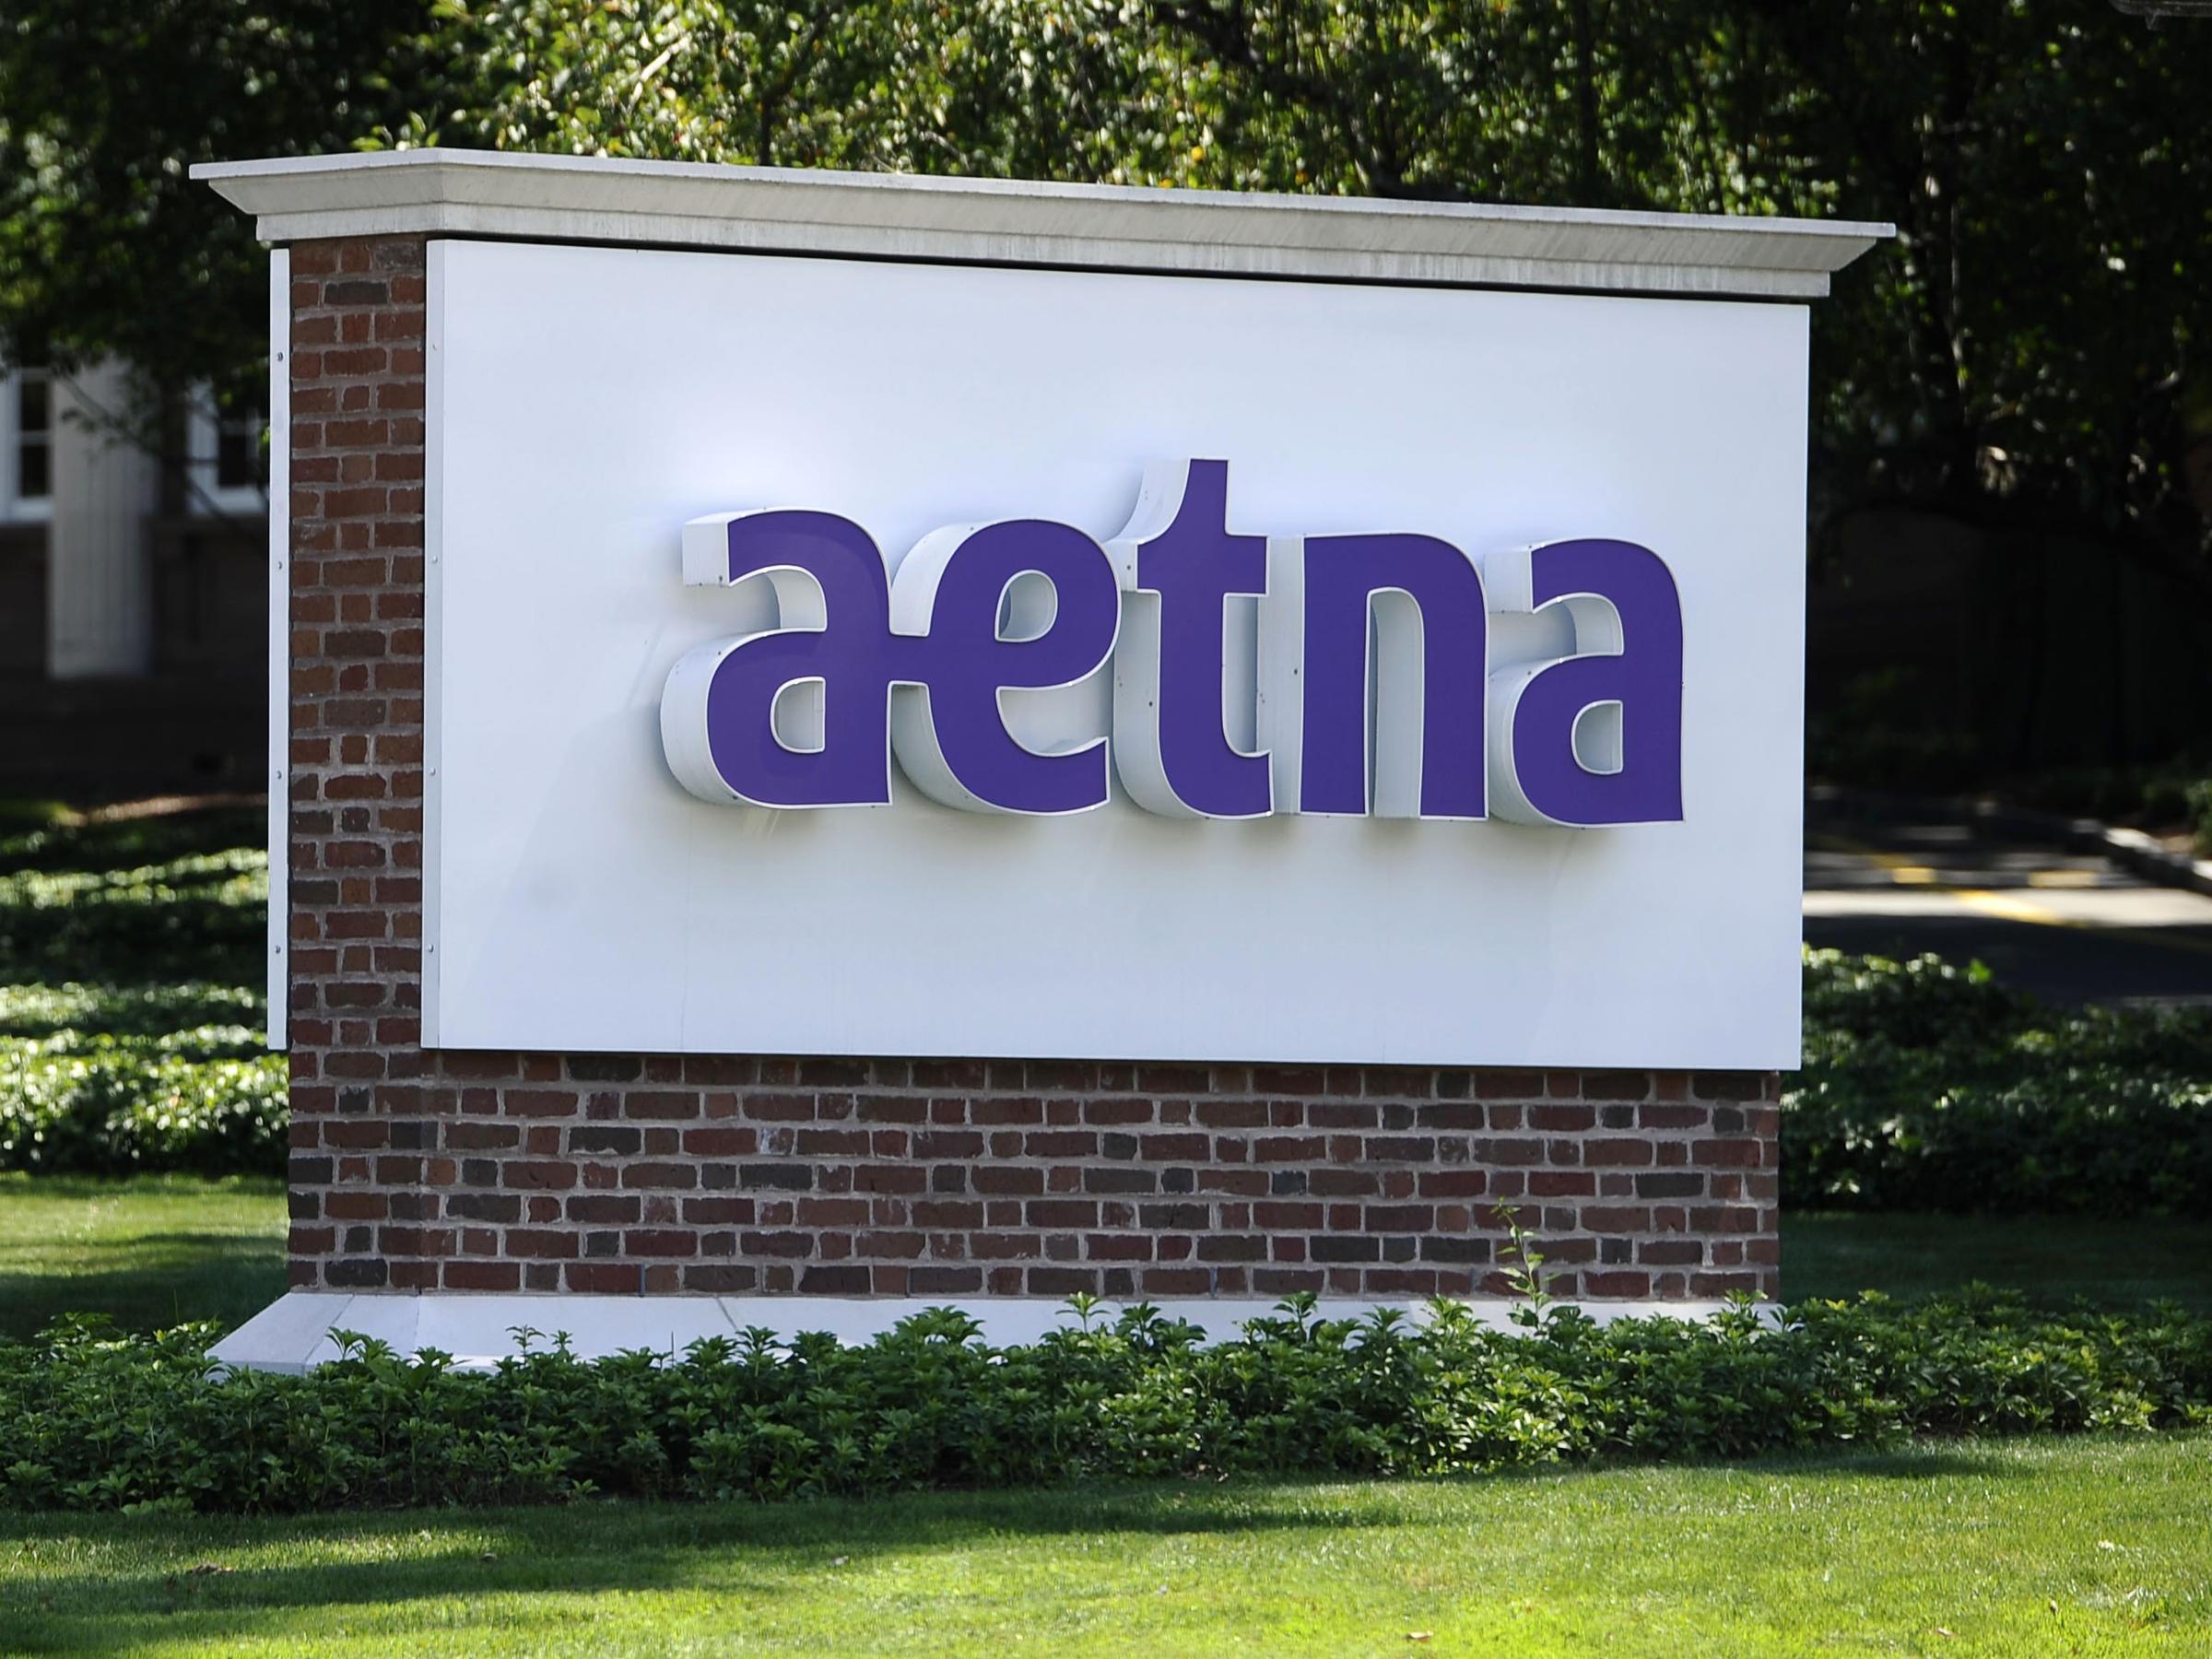 Judge blocks health insurer Aetna's $34b Humana acquisition